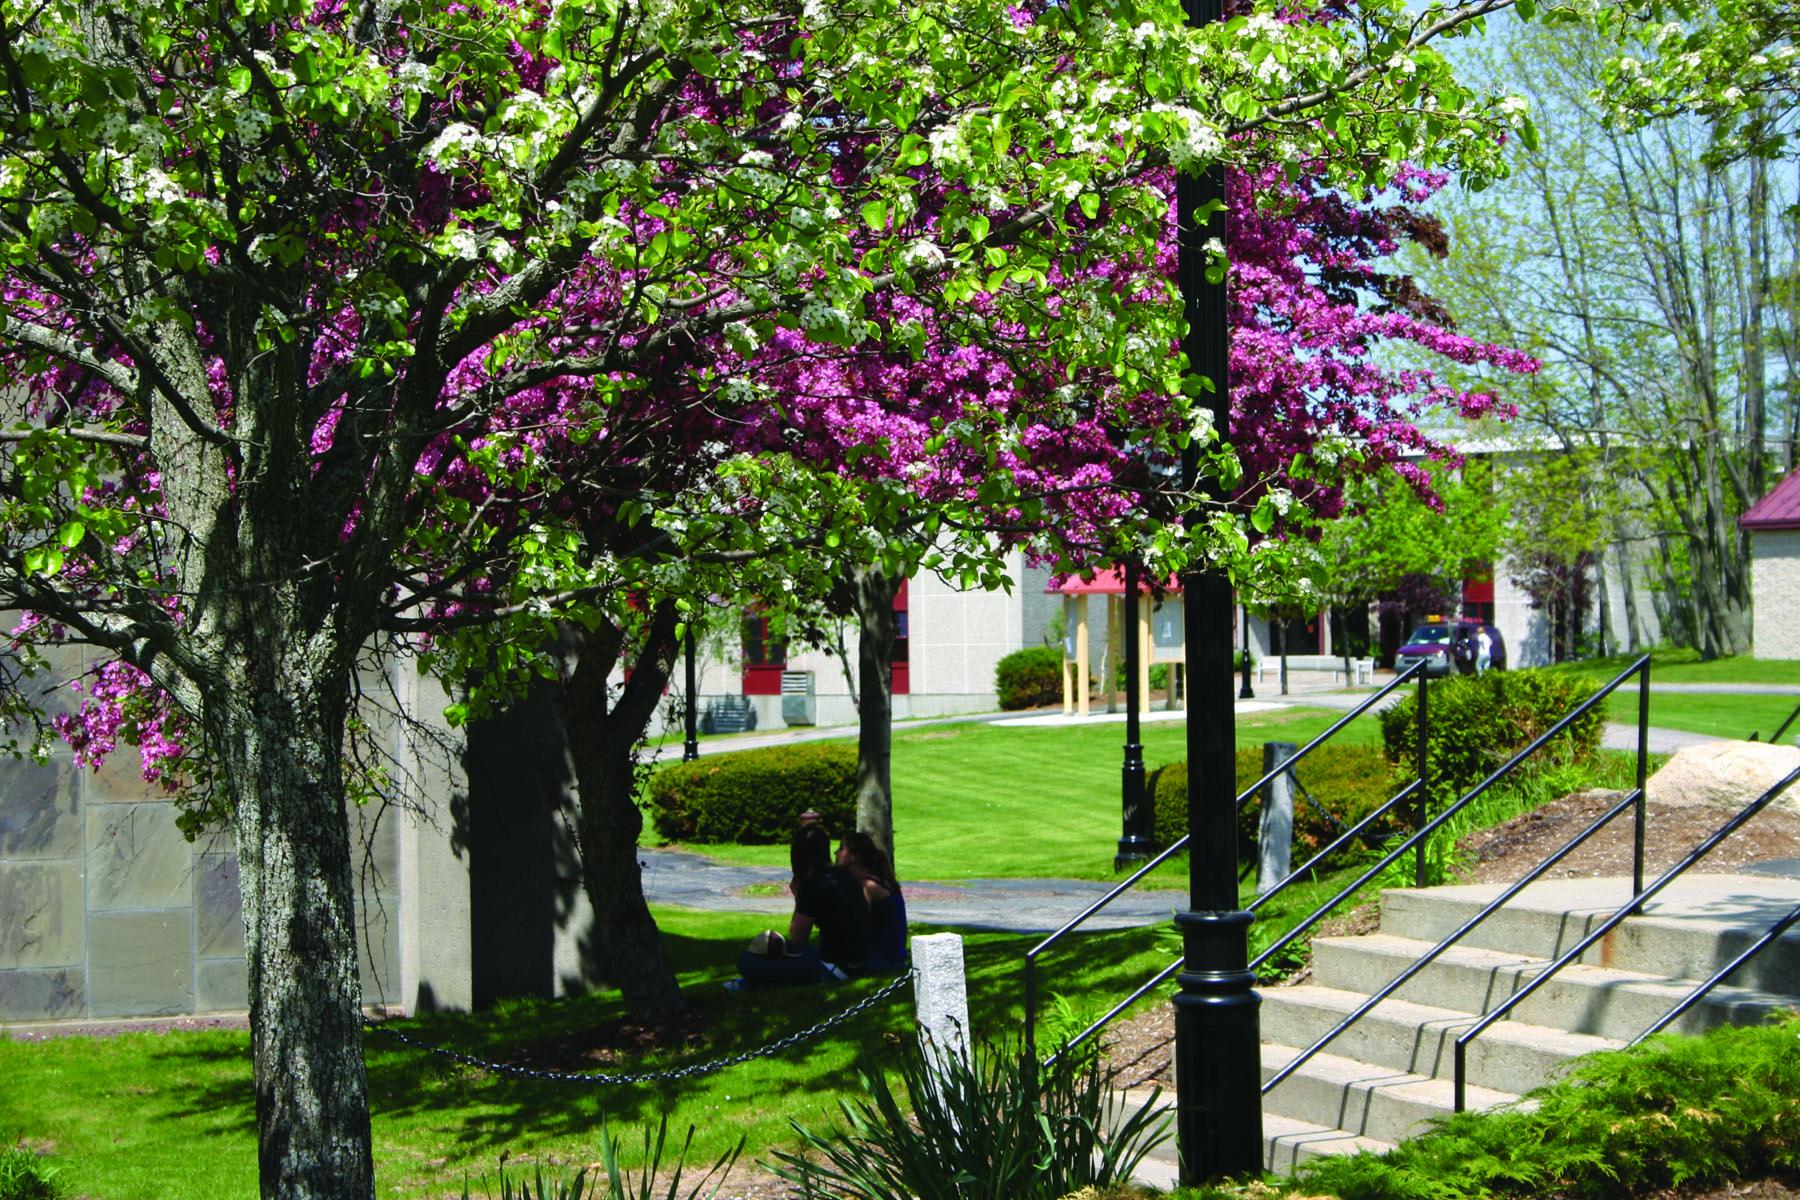 fpu-campus-photo-1526576320.jpg